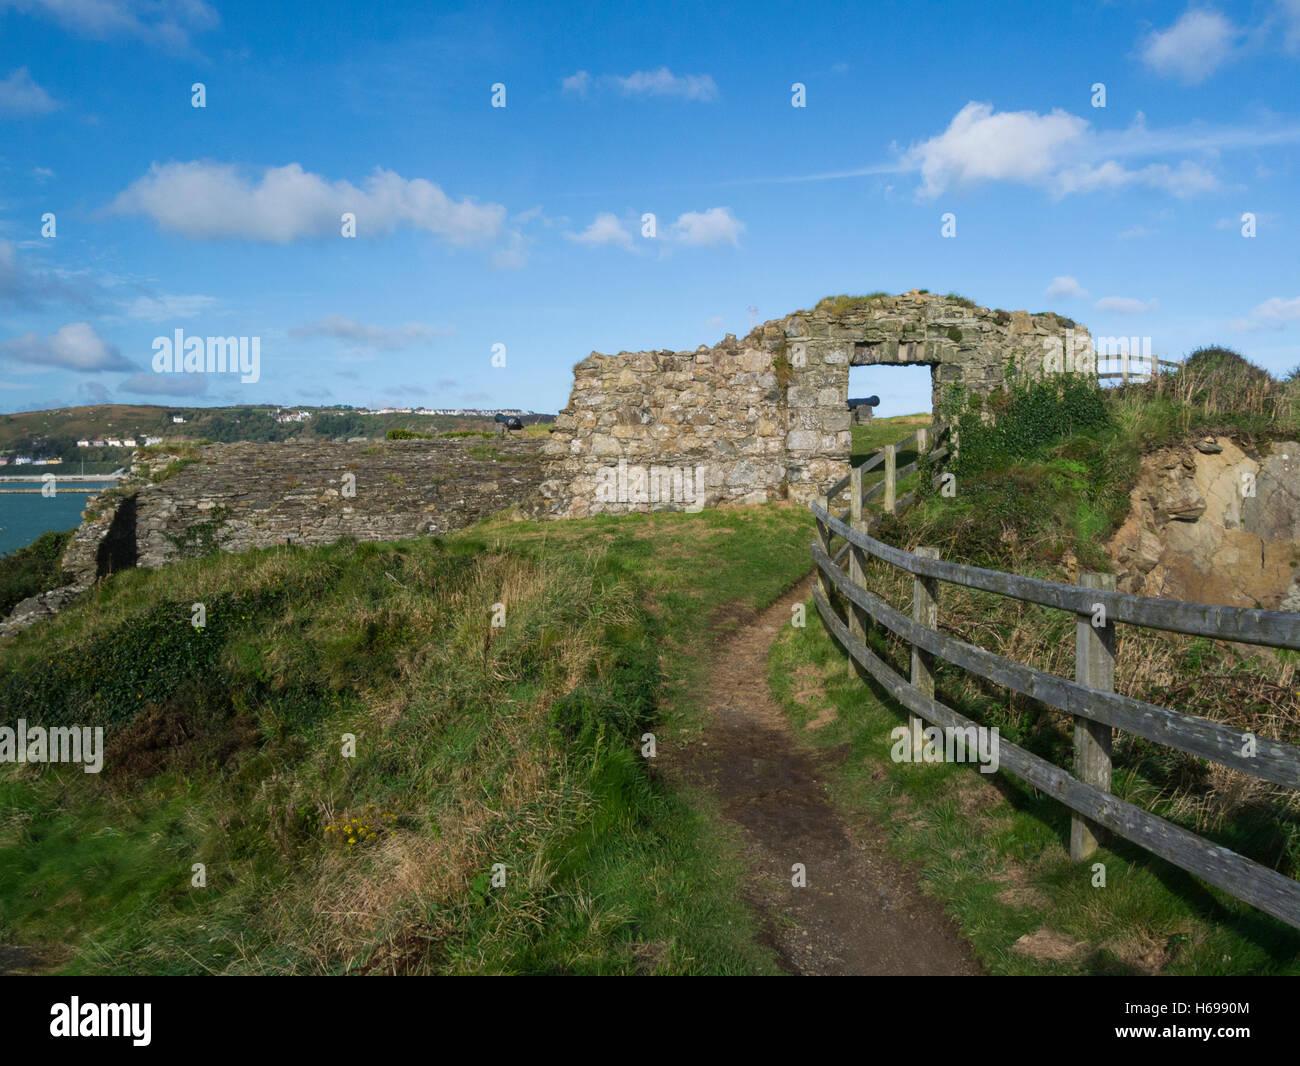 Fishguard Fort ruins built 1781 to guard prosperous port Pembrokeshire South Wales UK on Pembrokeshire Coastal Path - Stock Image